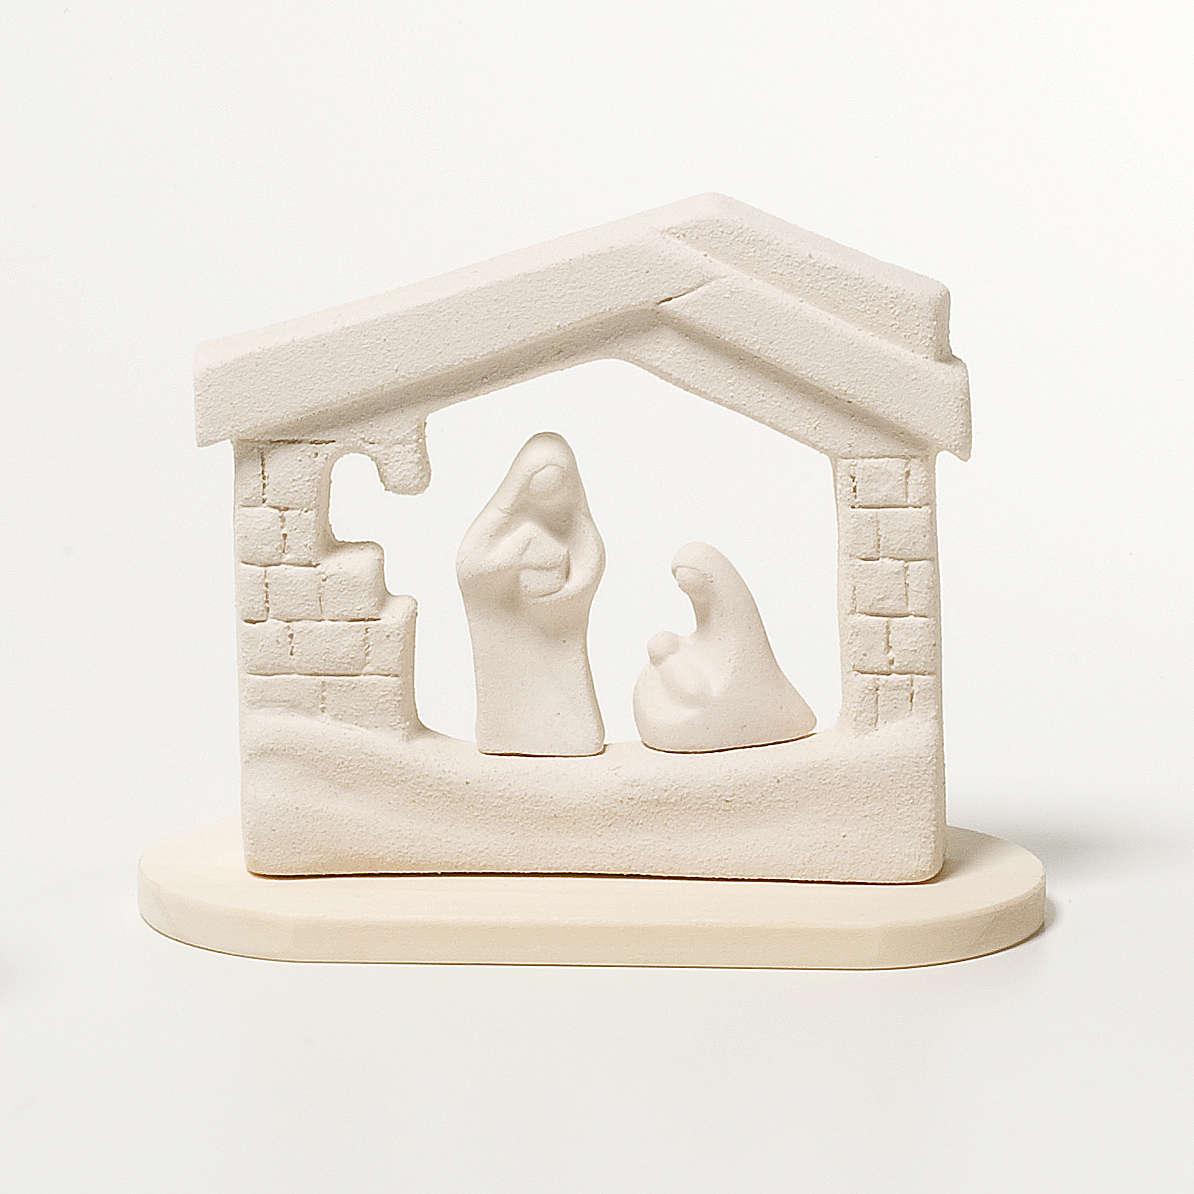 Presépio casa Natal sobre base argila 14,5 cm 4